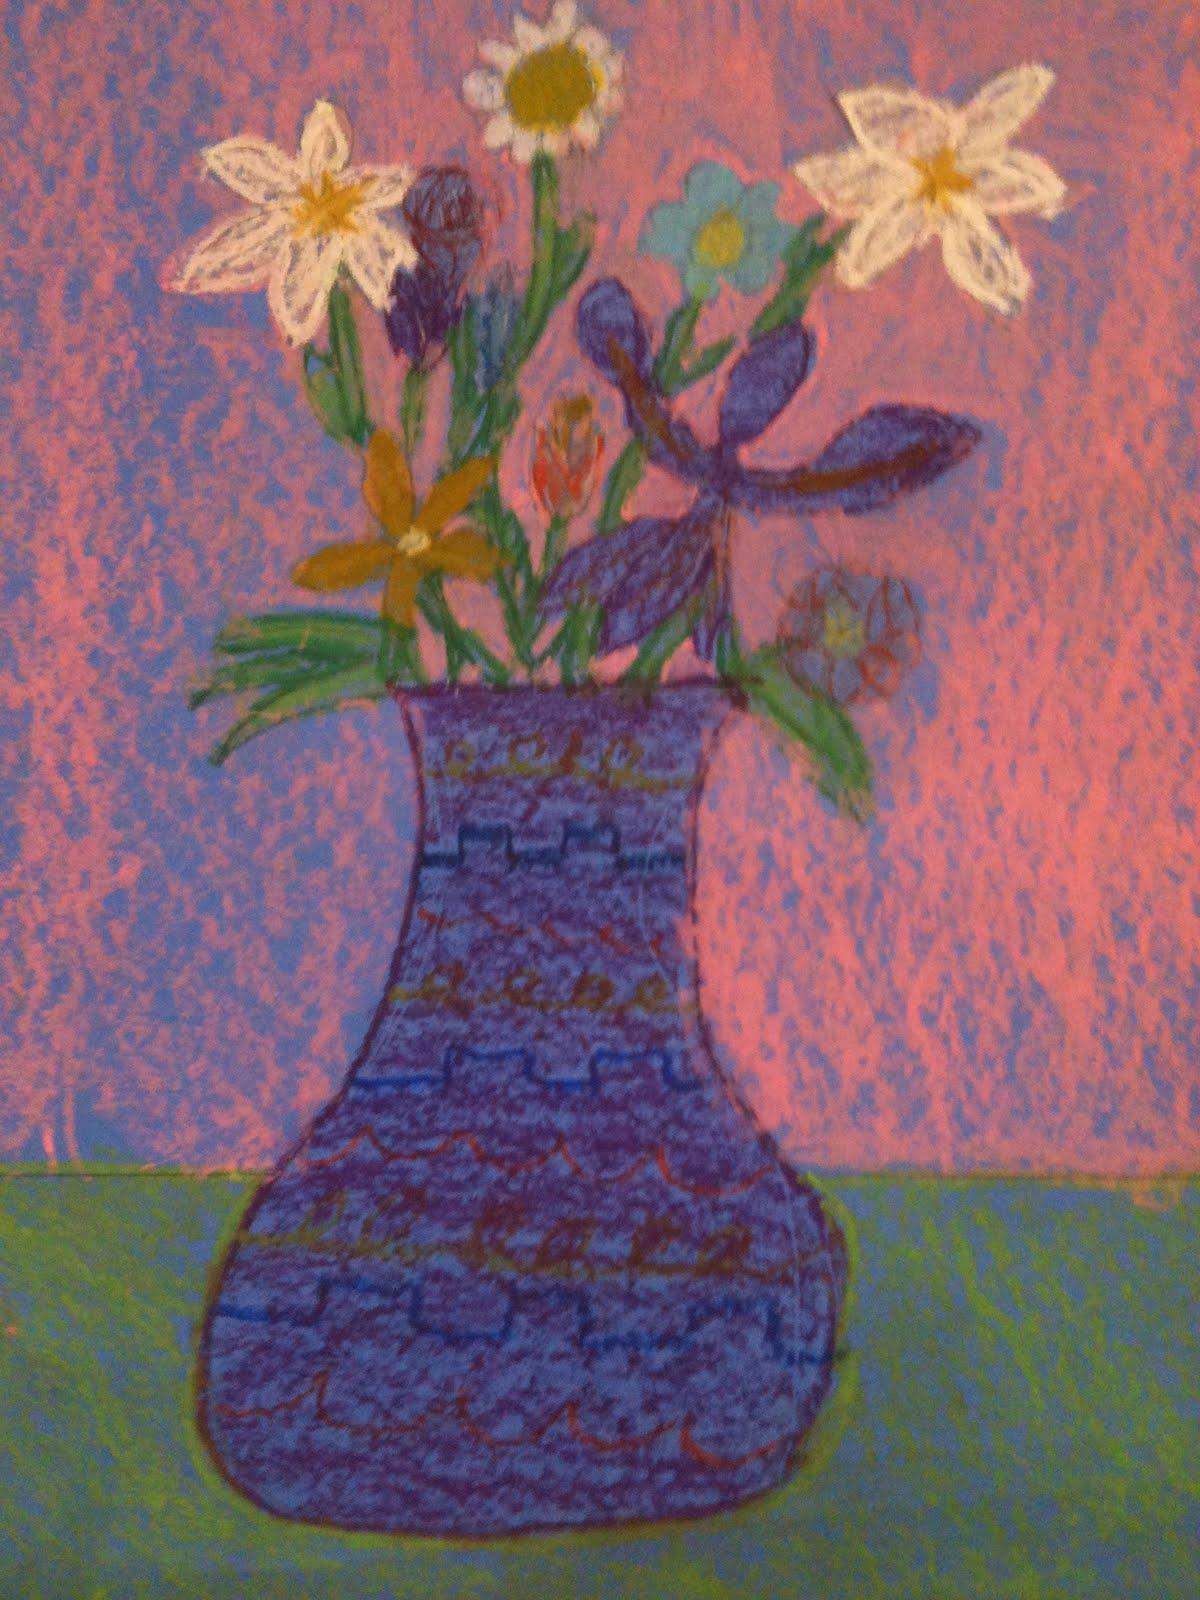 Creating Art 3rd Grade Flowers in Vases